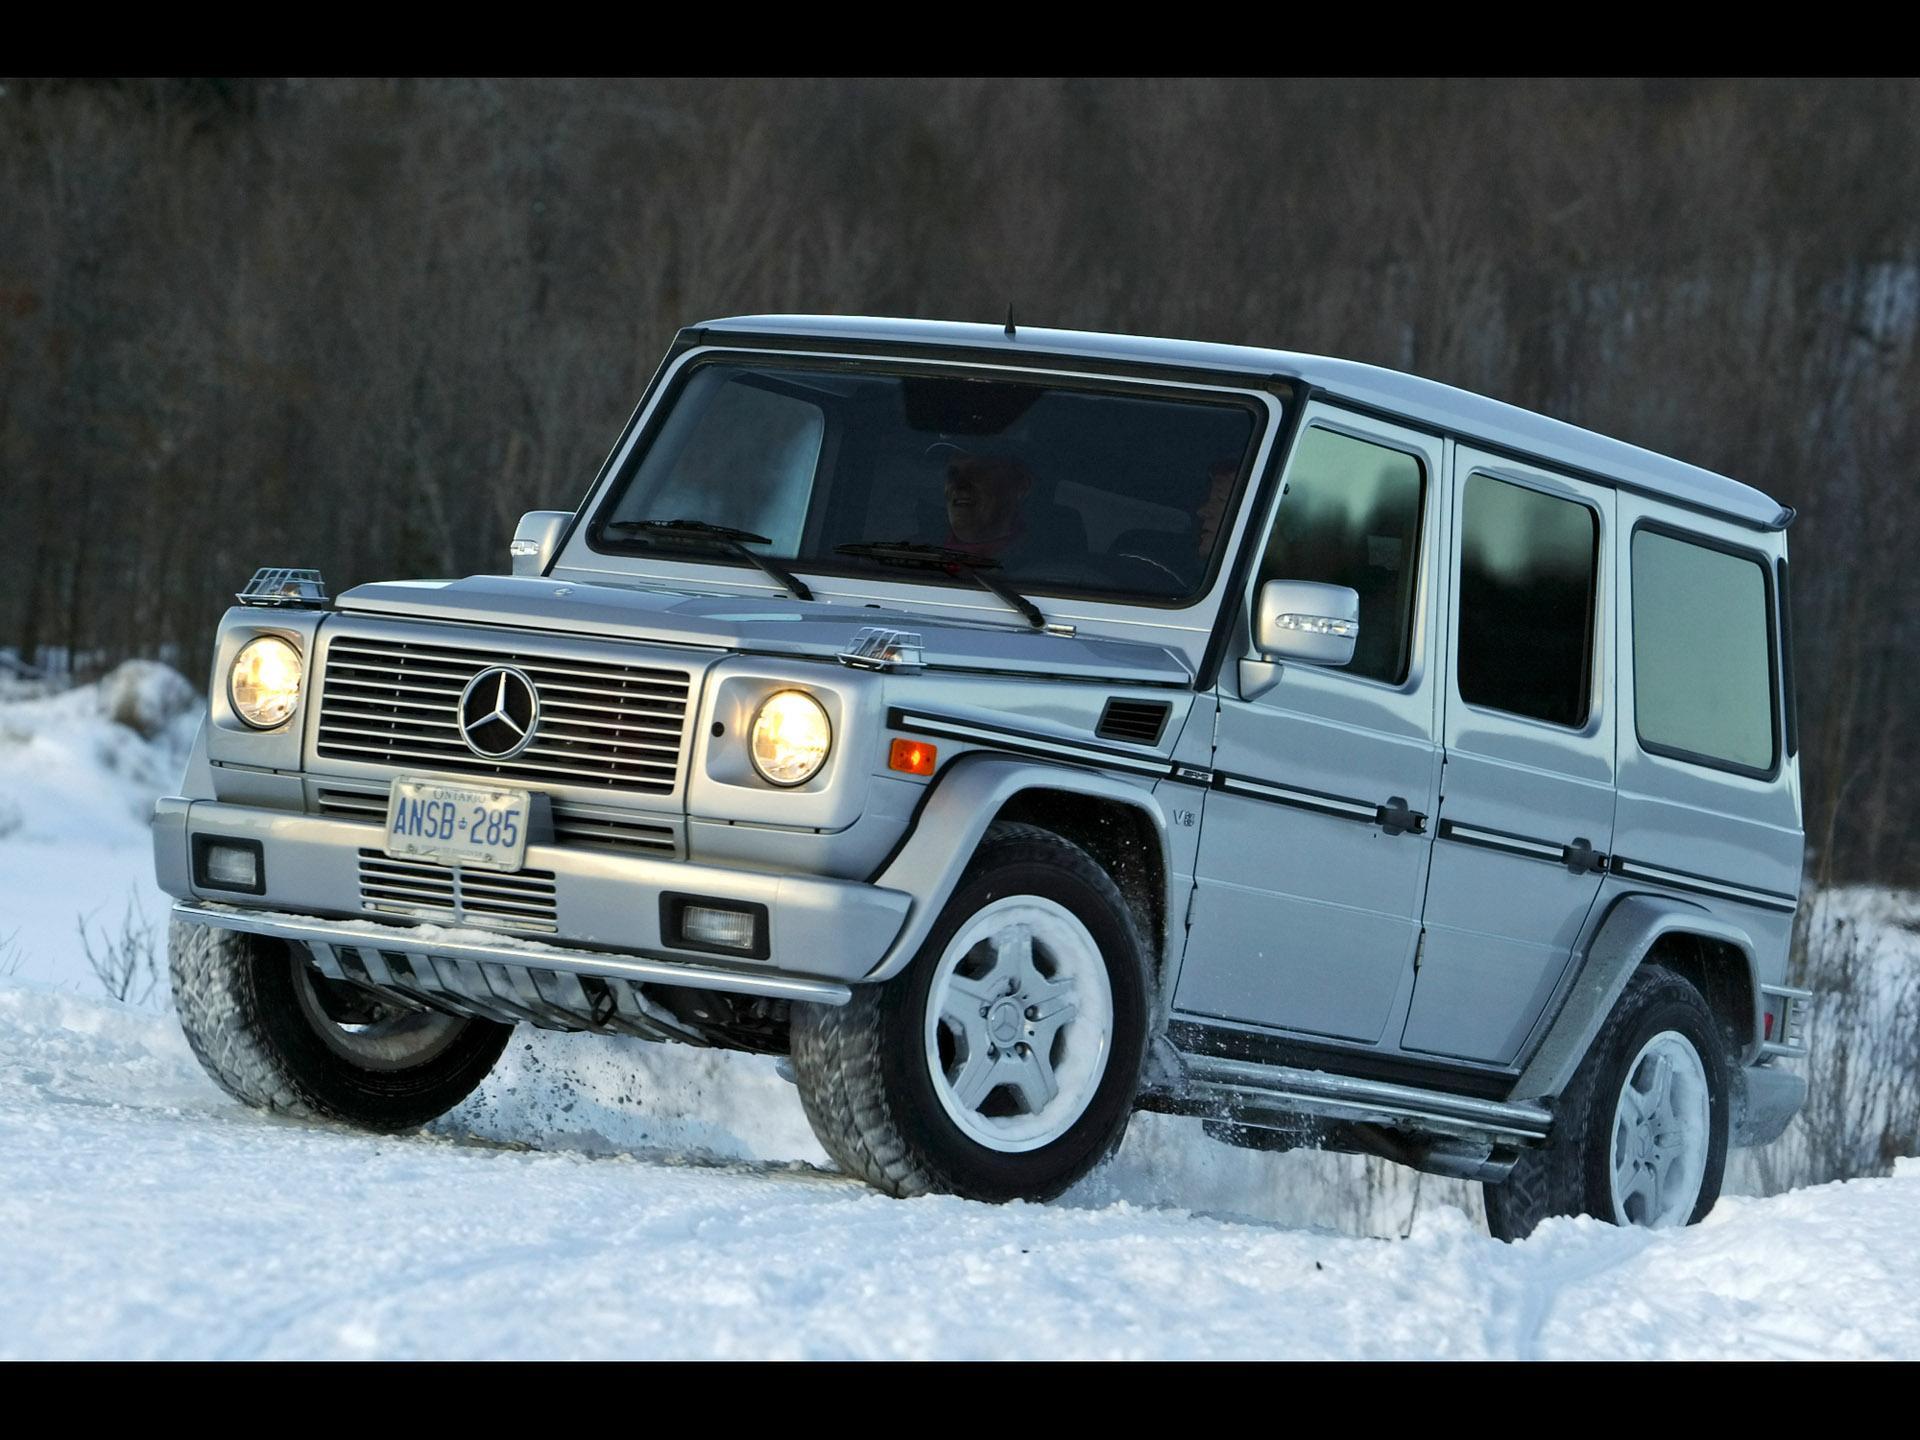 Mercedes benz g class amg picture 22192 mercedes benz for Mercedes benz amg g class